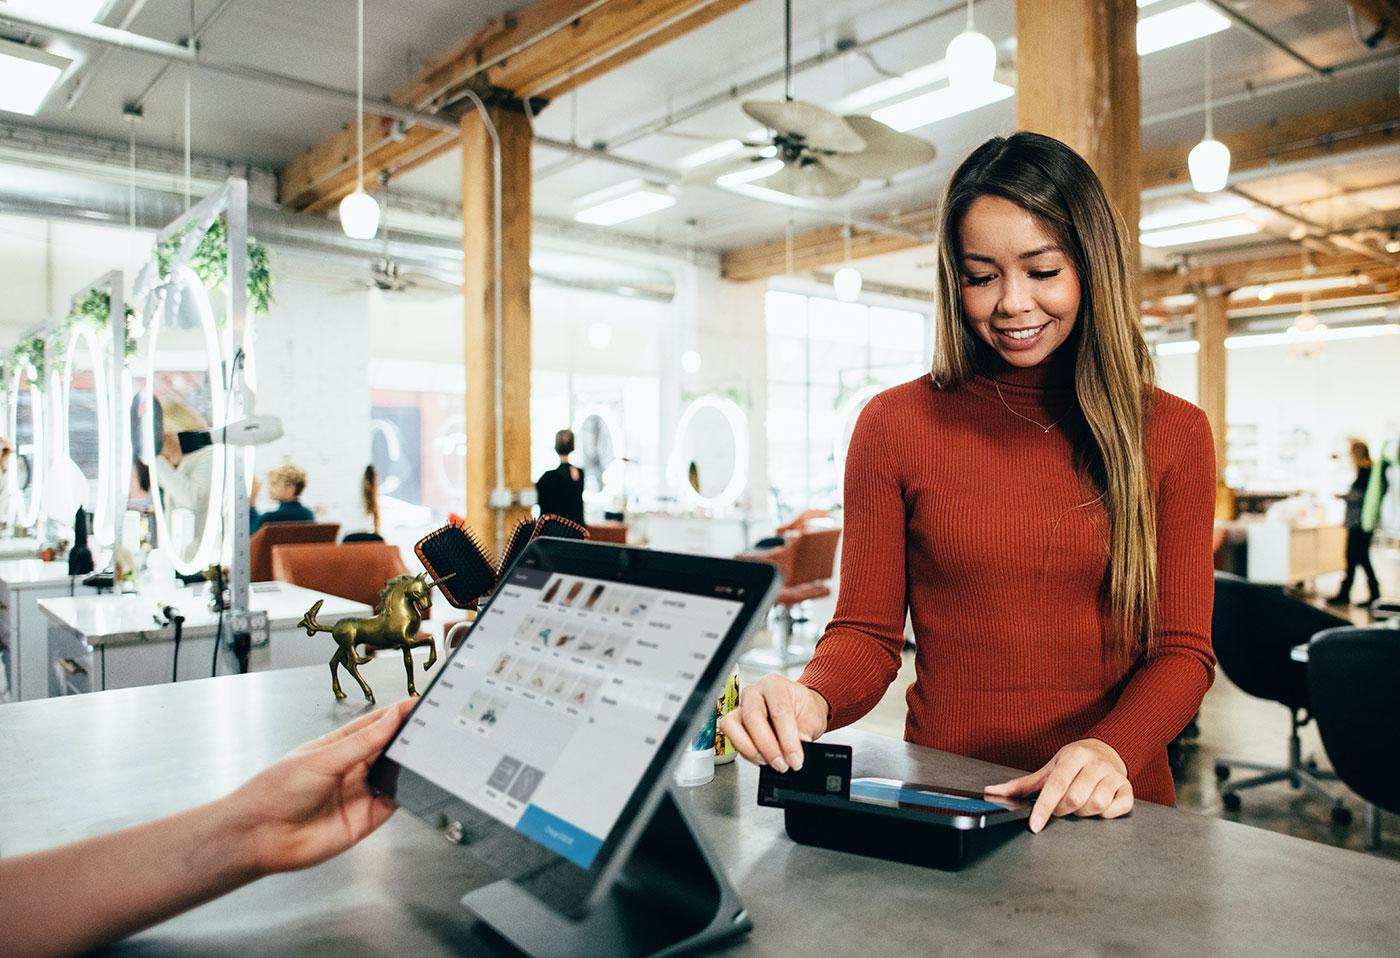 Woman using payment terminal